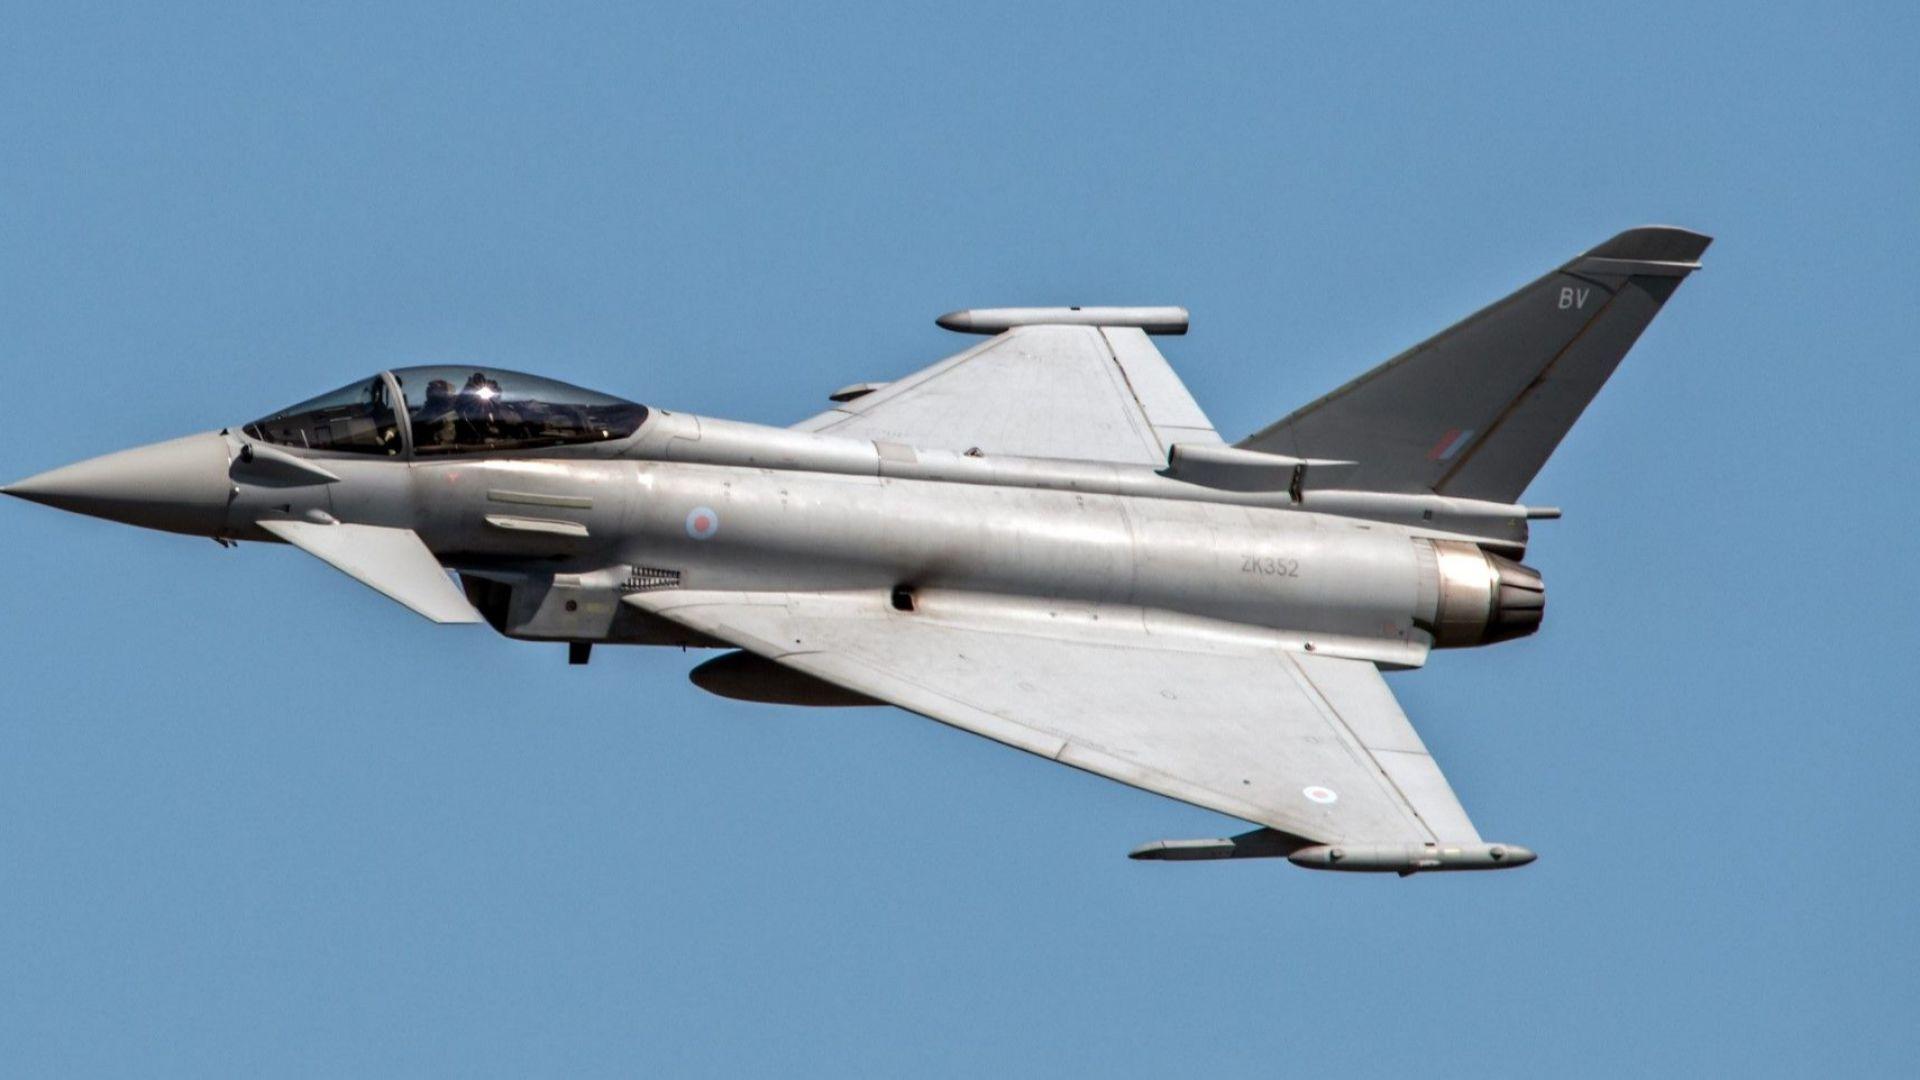 Русия: Великобритания прехвана опасно наши самолети